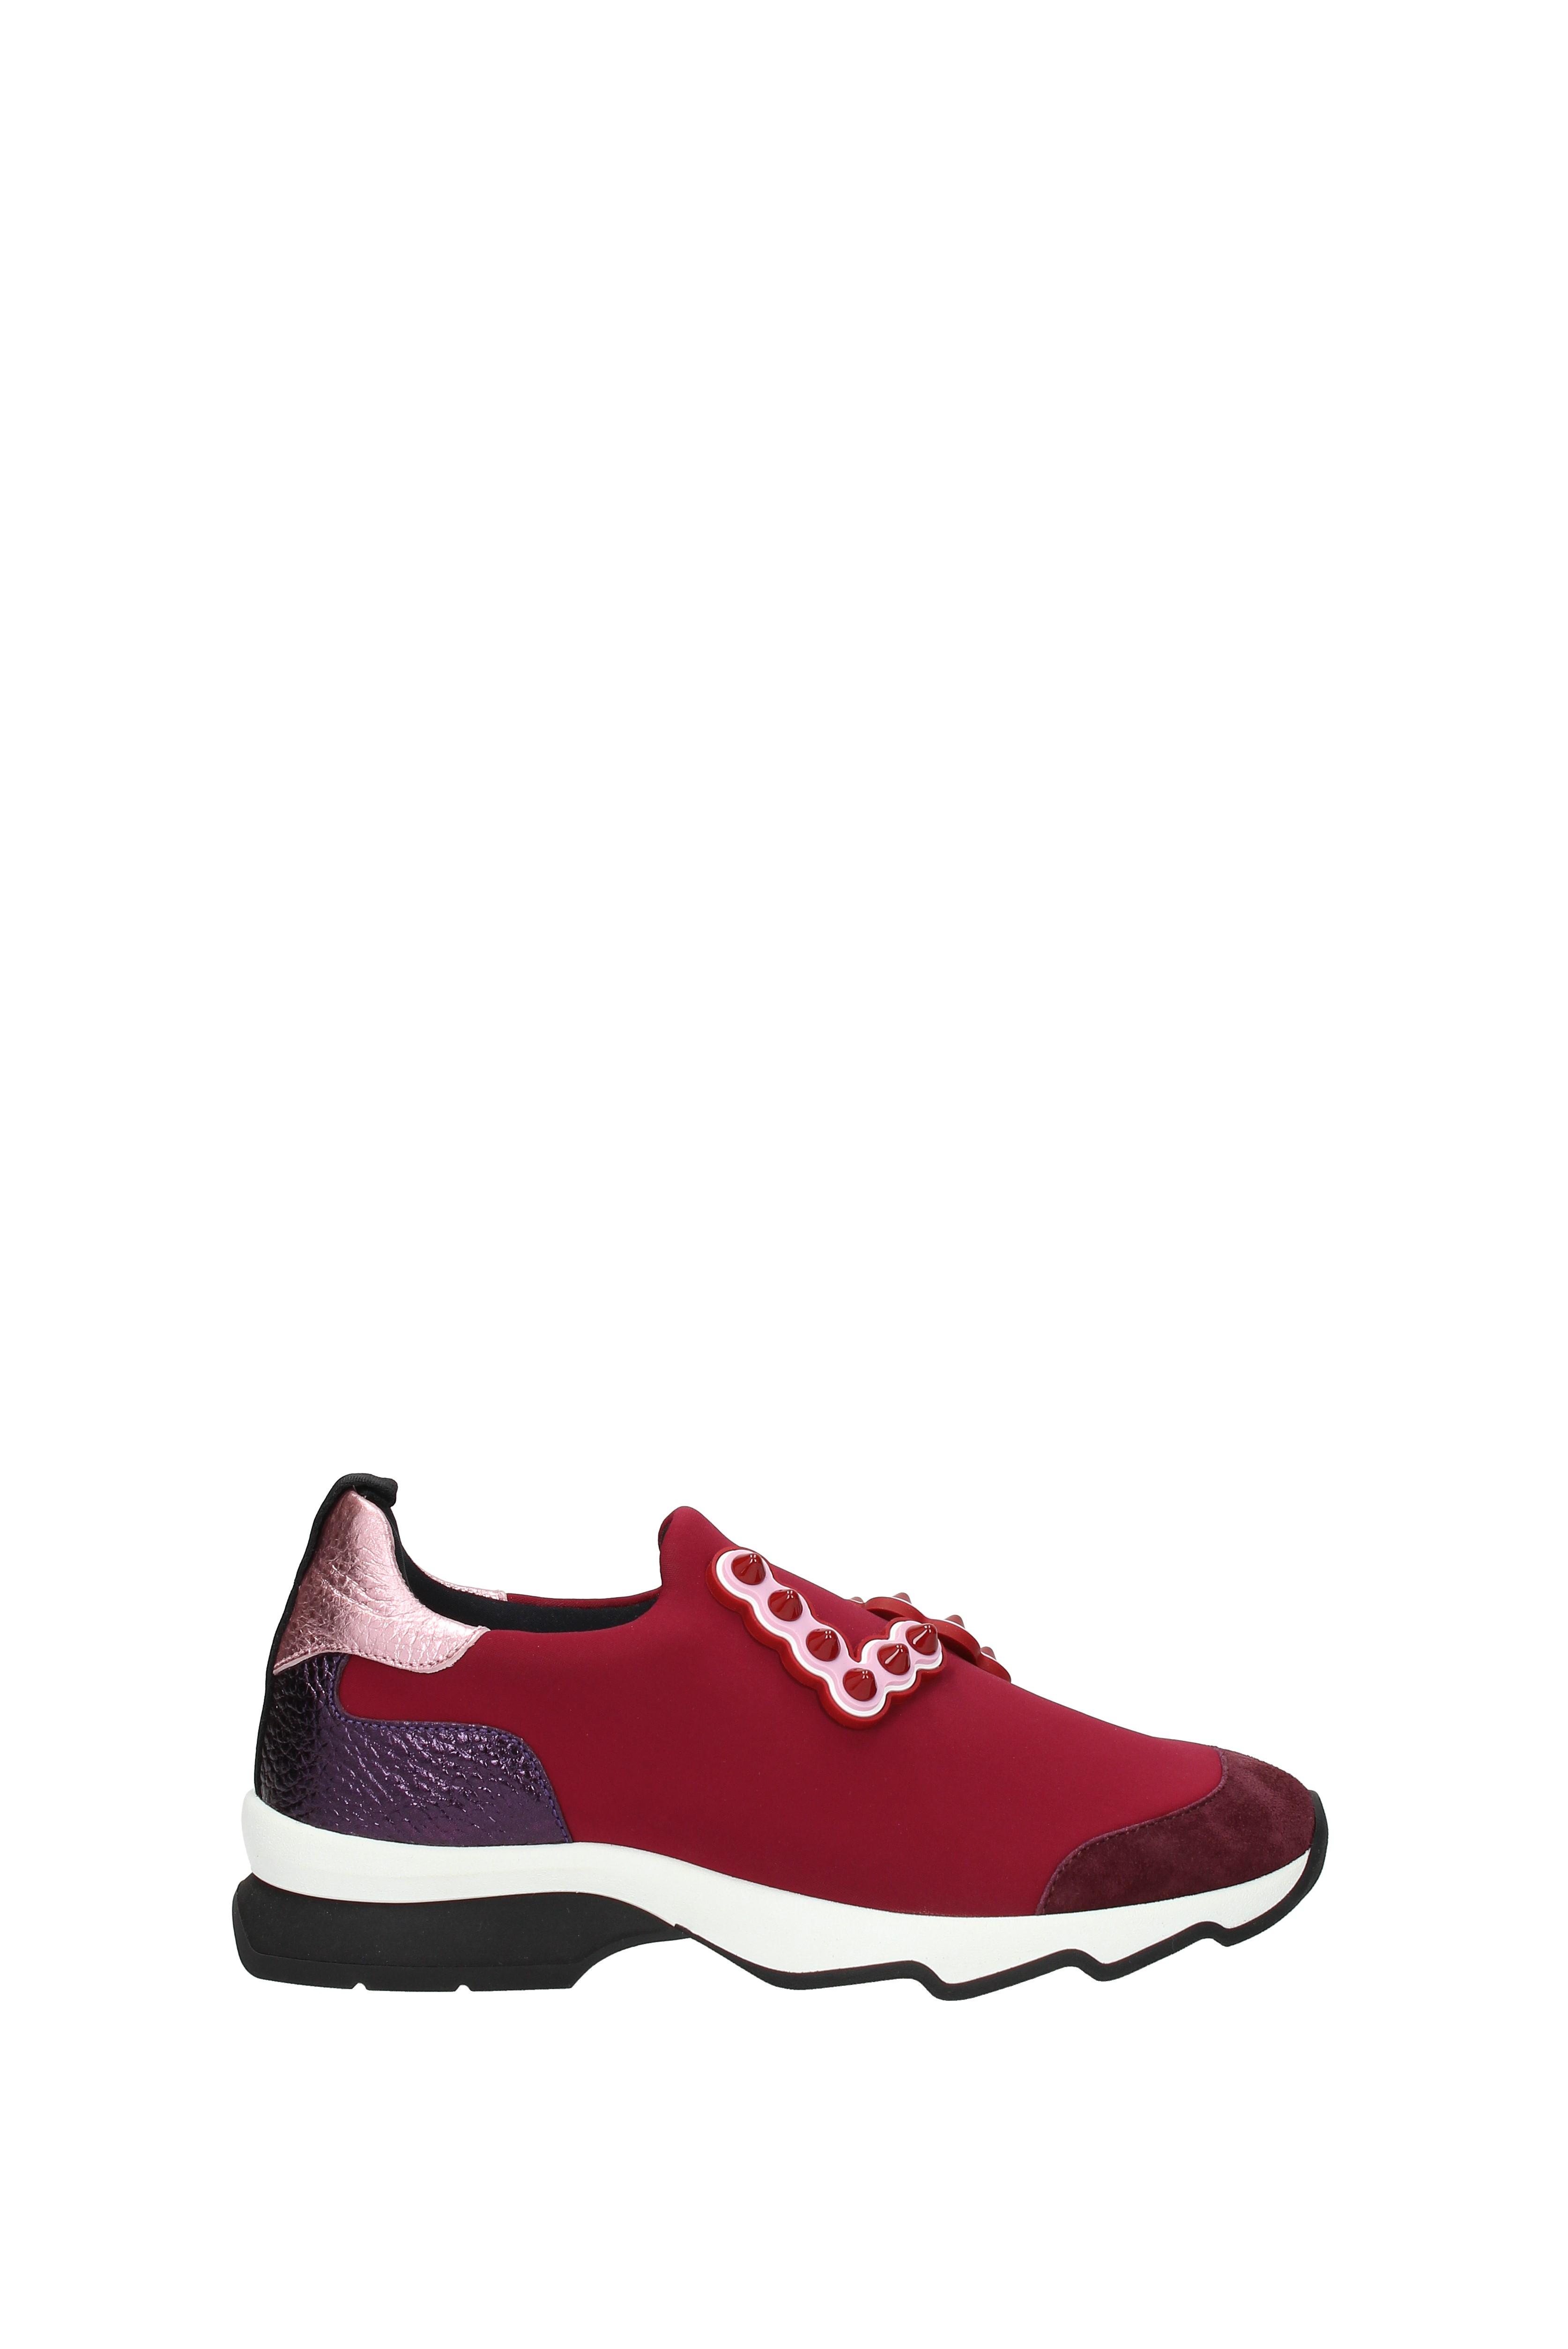 Sneakers Fendi Damen - - Damen Stoff (8E6698A16C) 432cf5